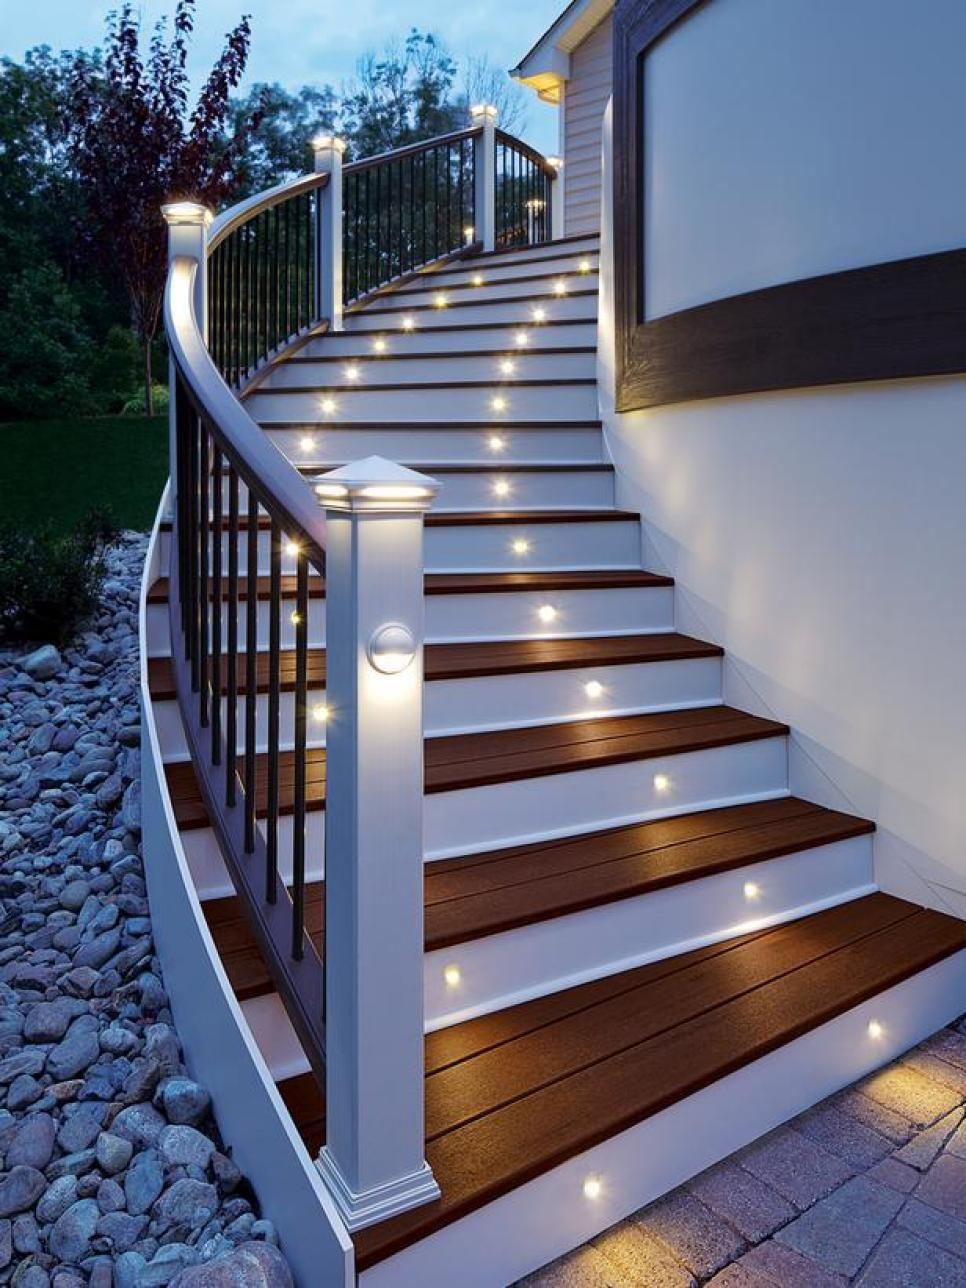 Outdoor Staircase 8 outdoor staircase ideas staircases outdoor stairs and outdoor 8497 by xevi.us